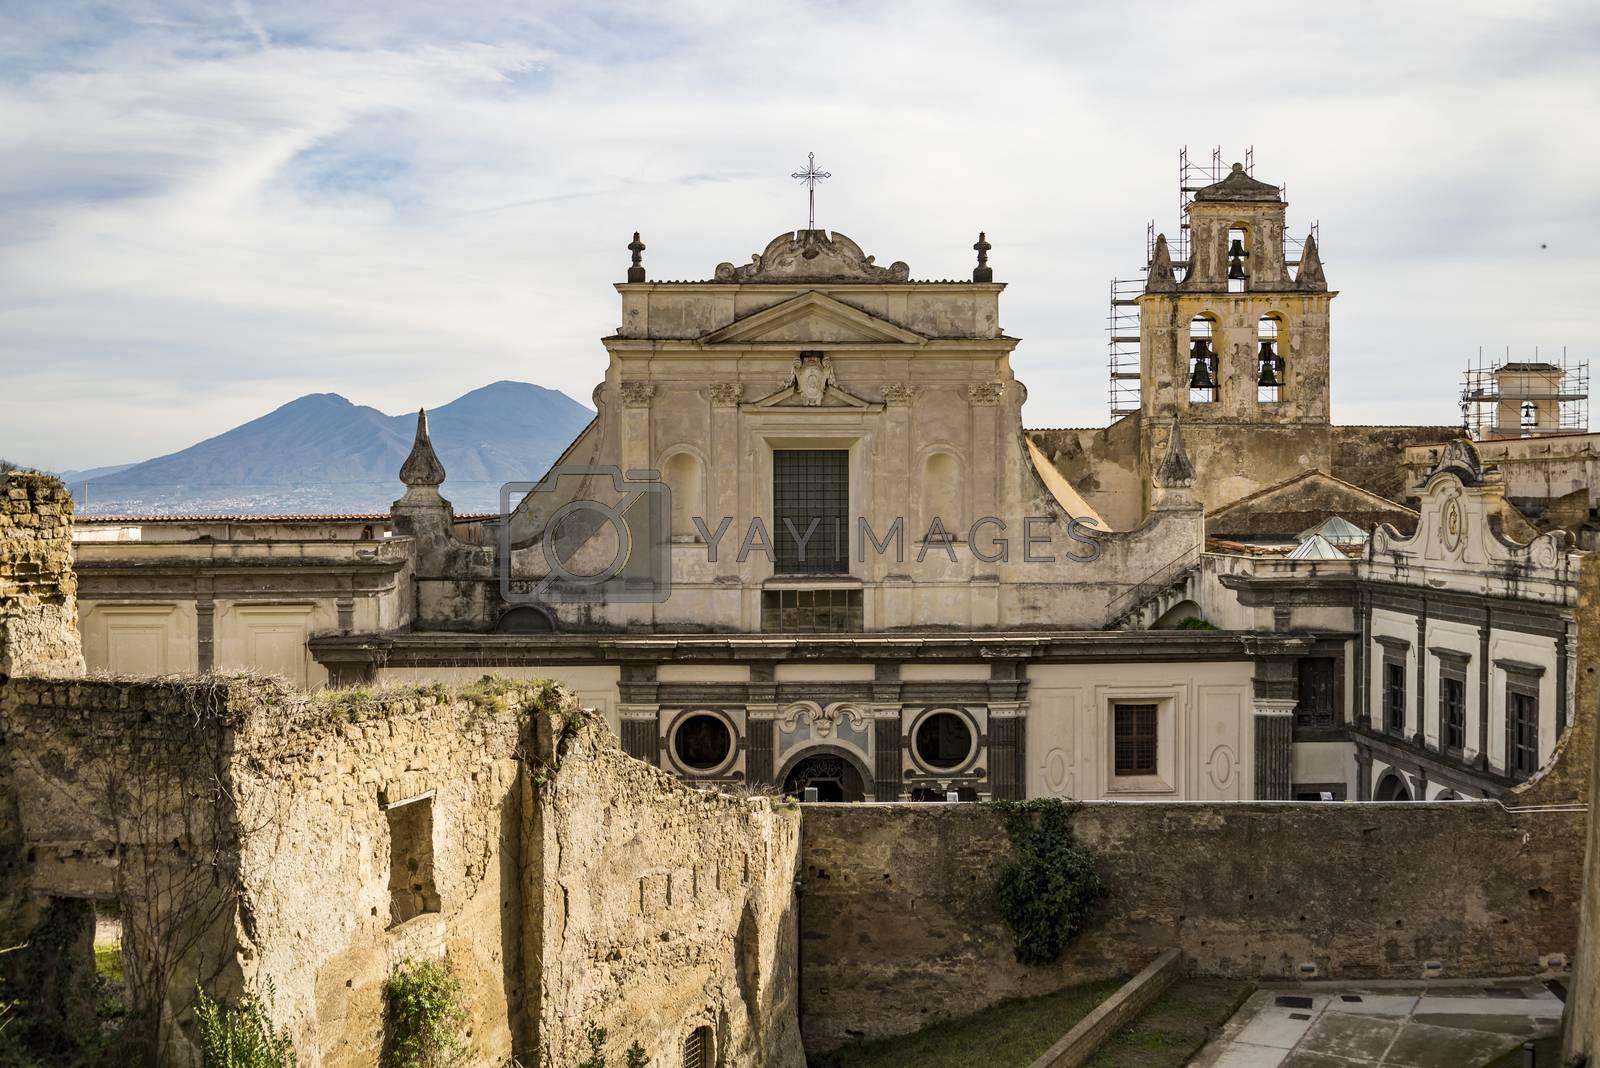 View of the Certosa di San Martino in Naples, Italy